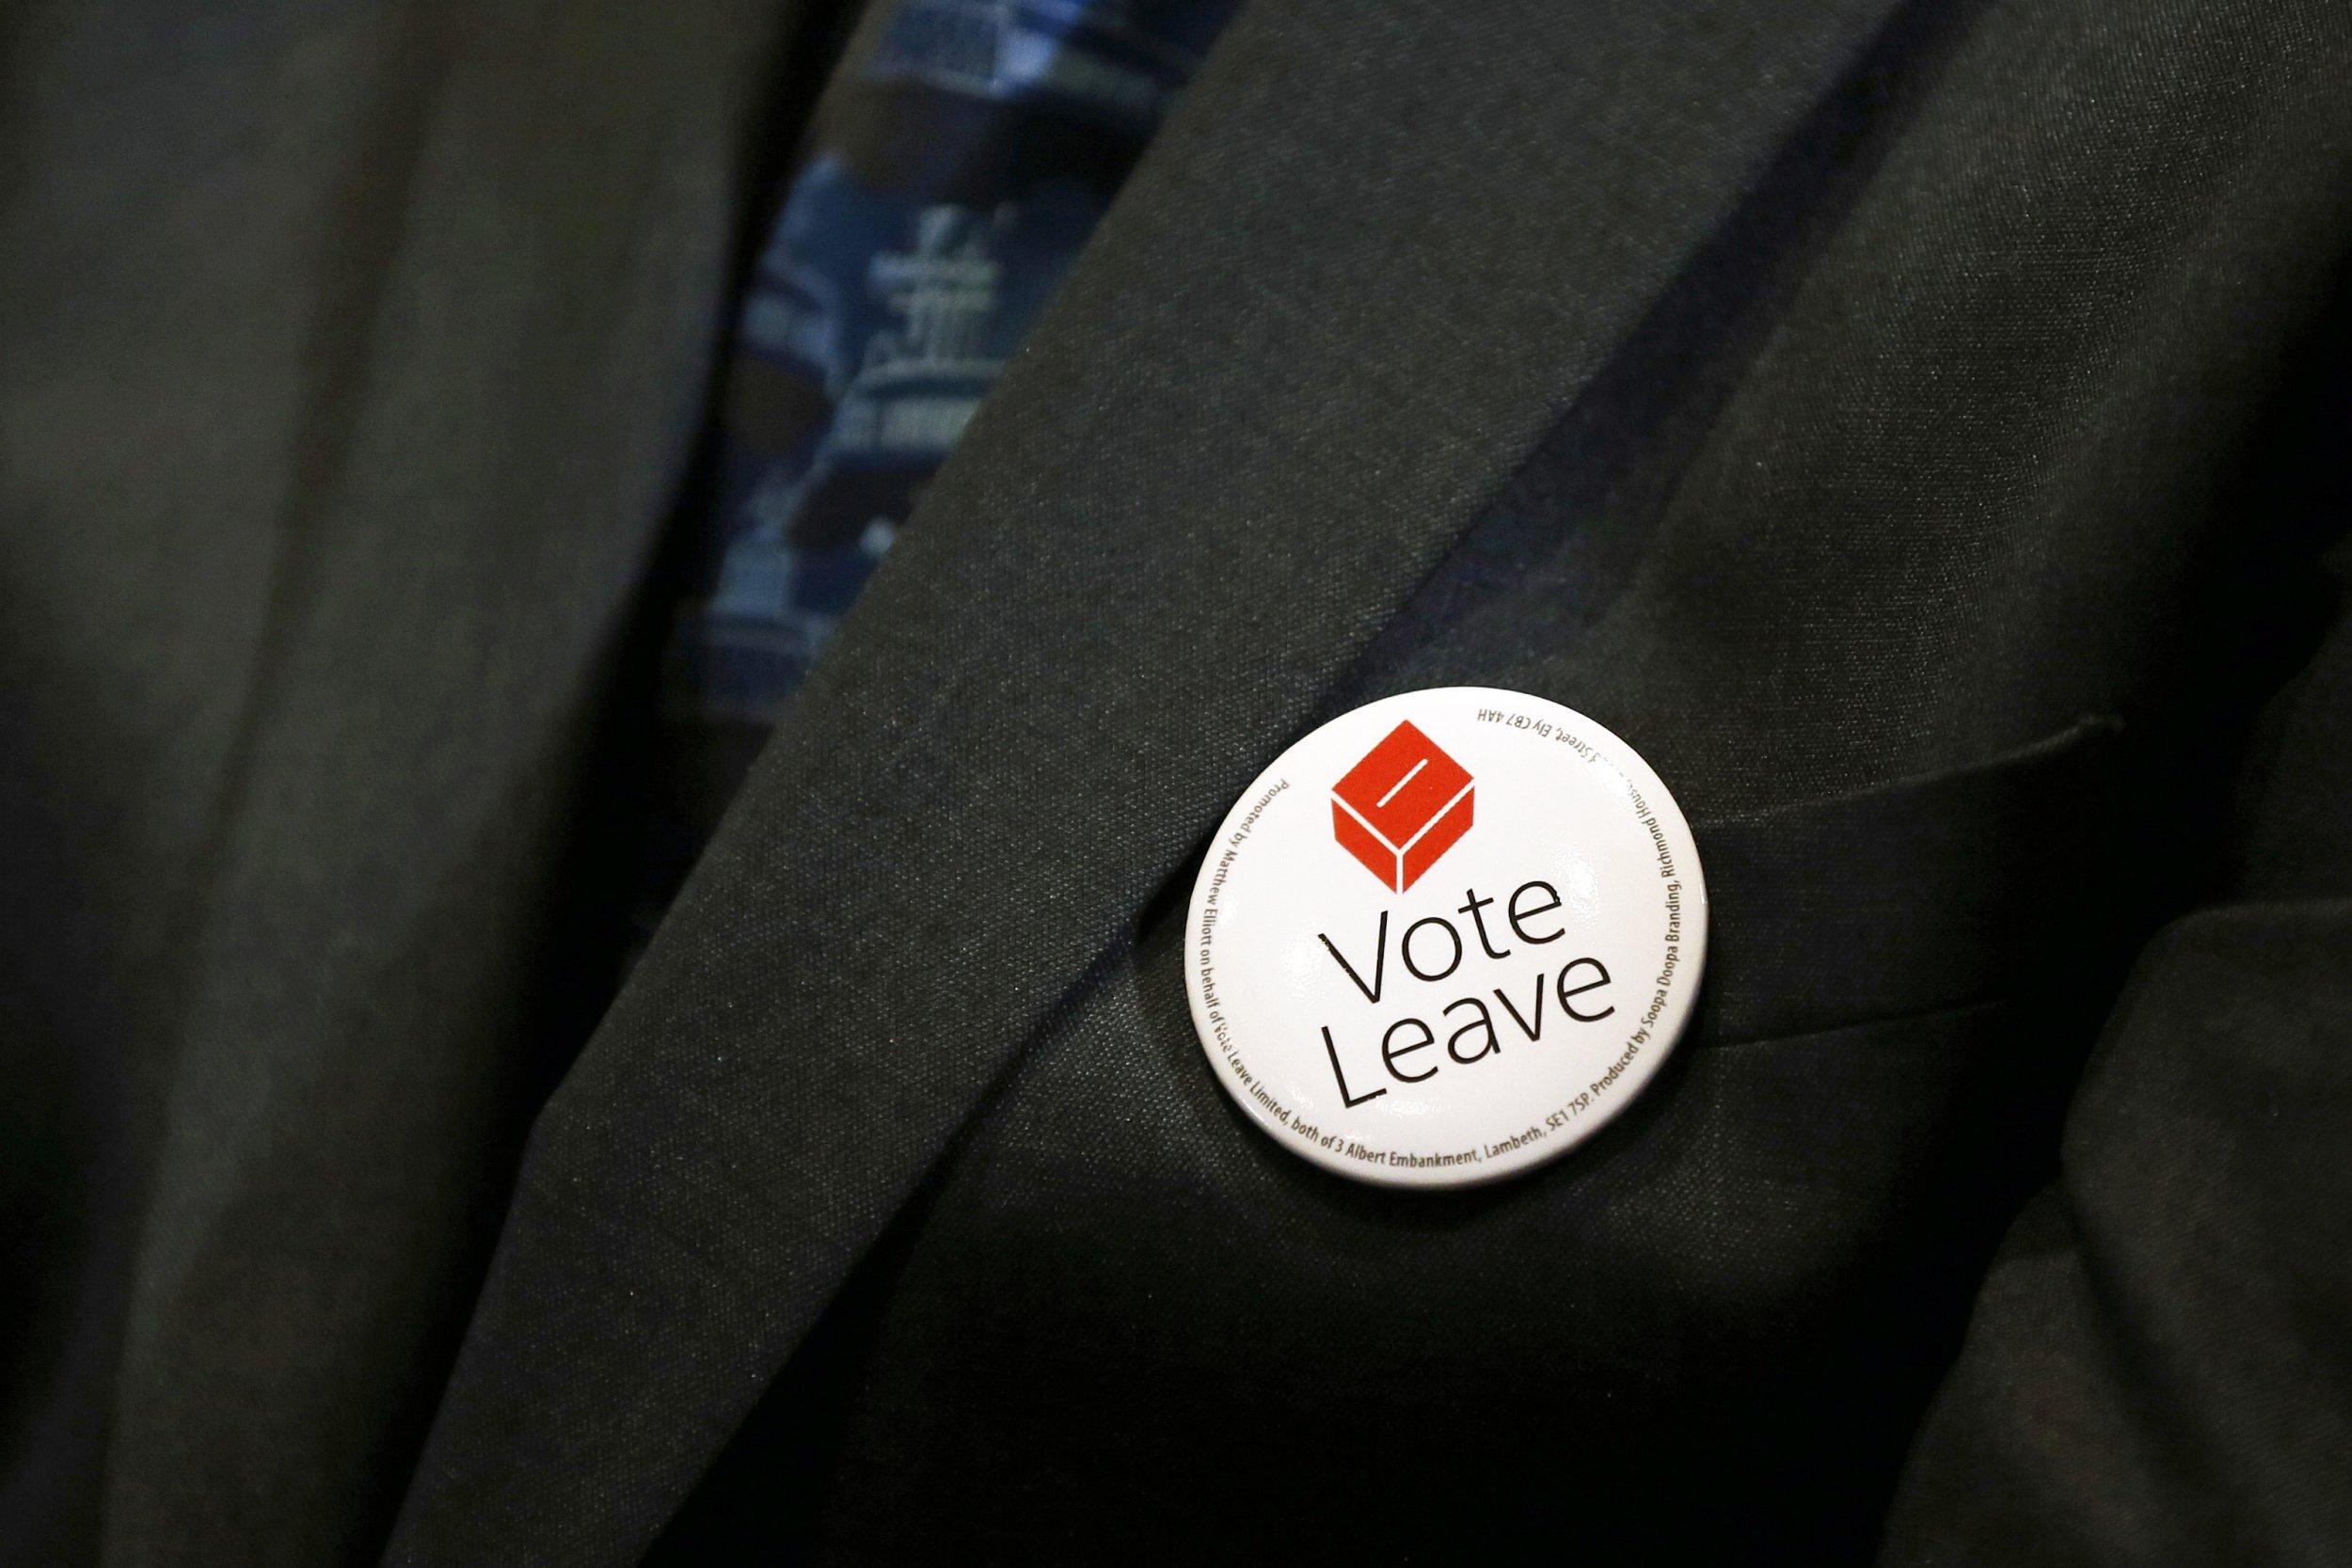 08/03/2016_Vote Leave Badge